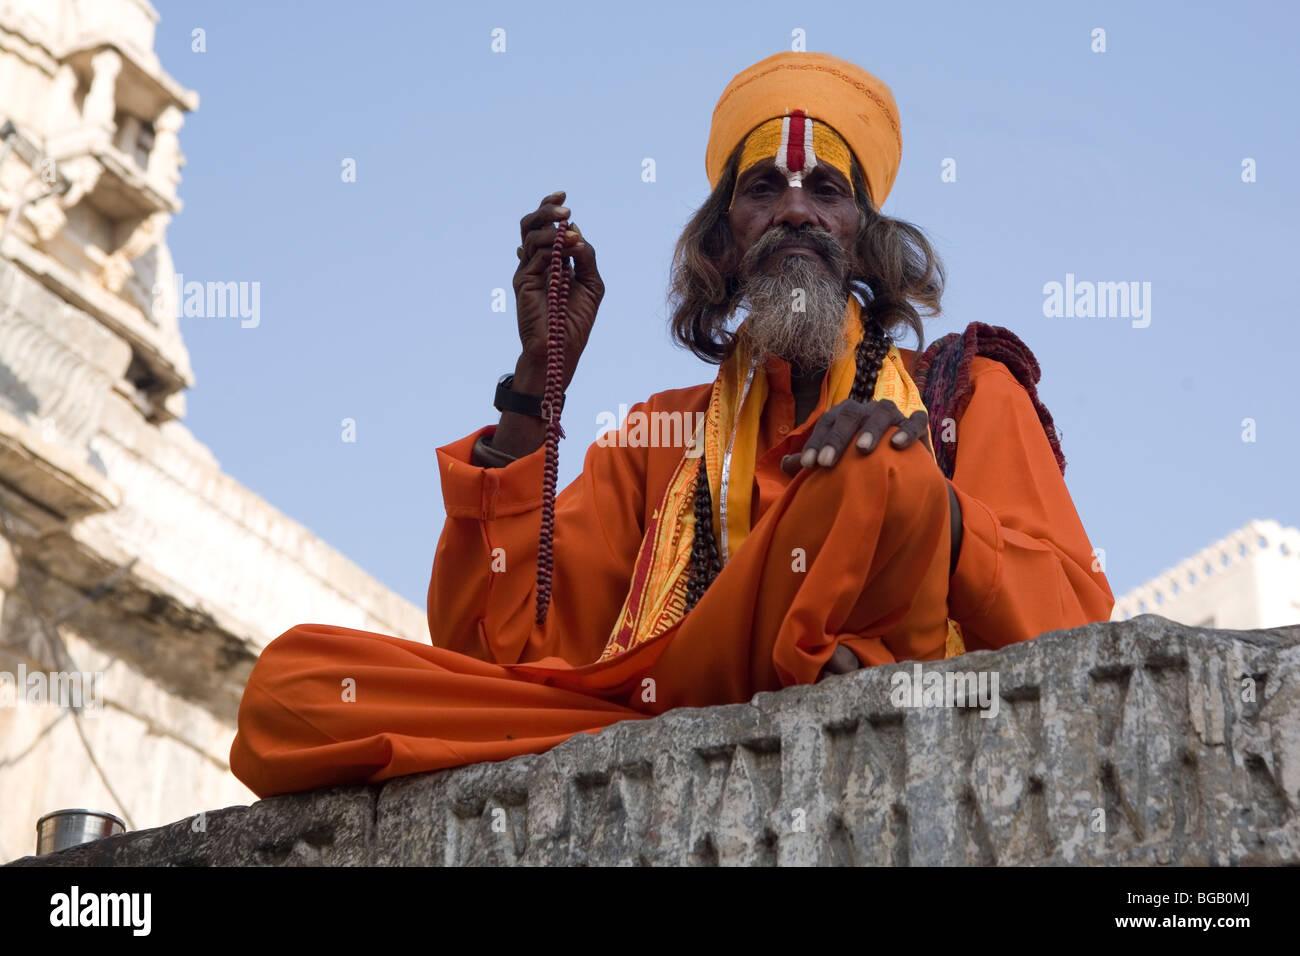 India Rajasthan Udaipur Jagdish Mandir Sadhu Stock Photo